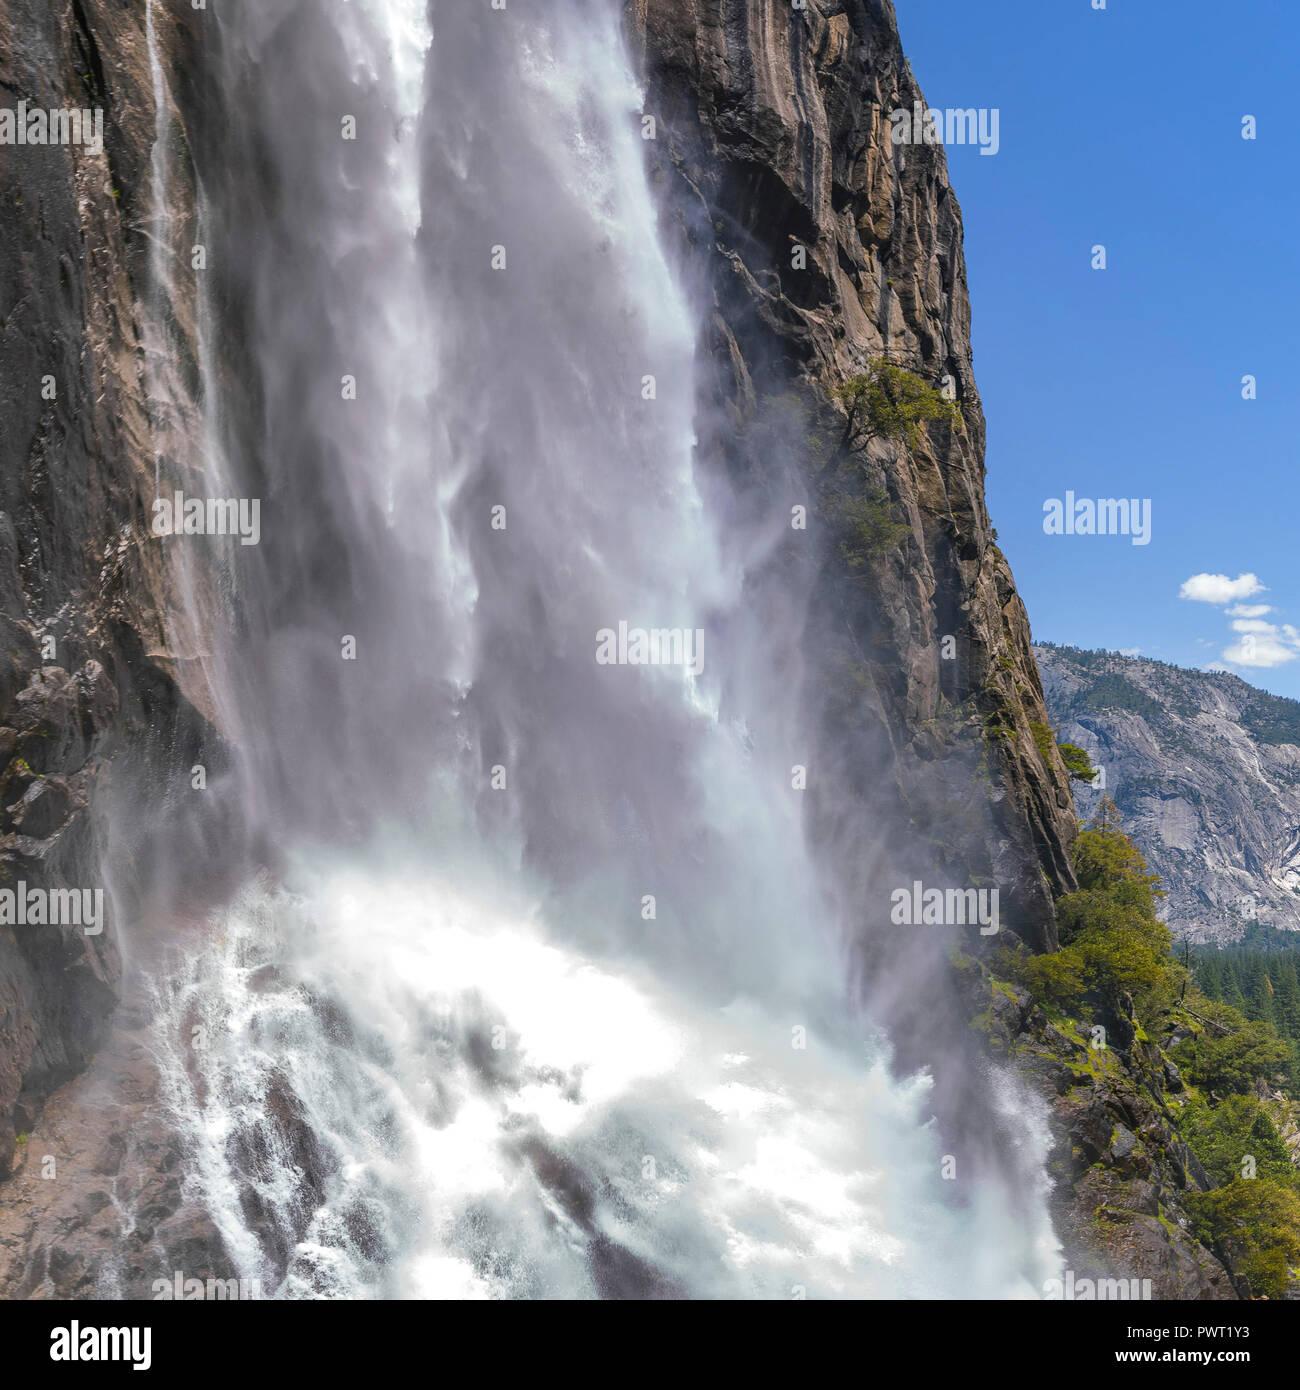 Cascading mächtige Wasser des Yosemite Falls closeup Stockbild